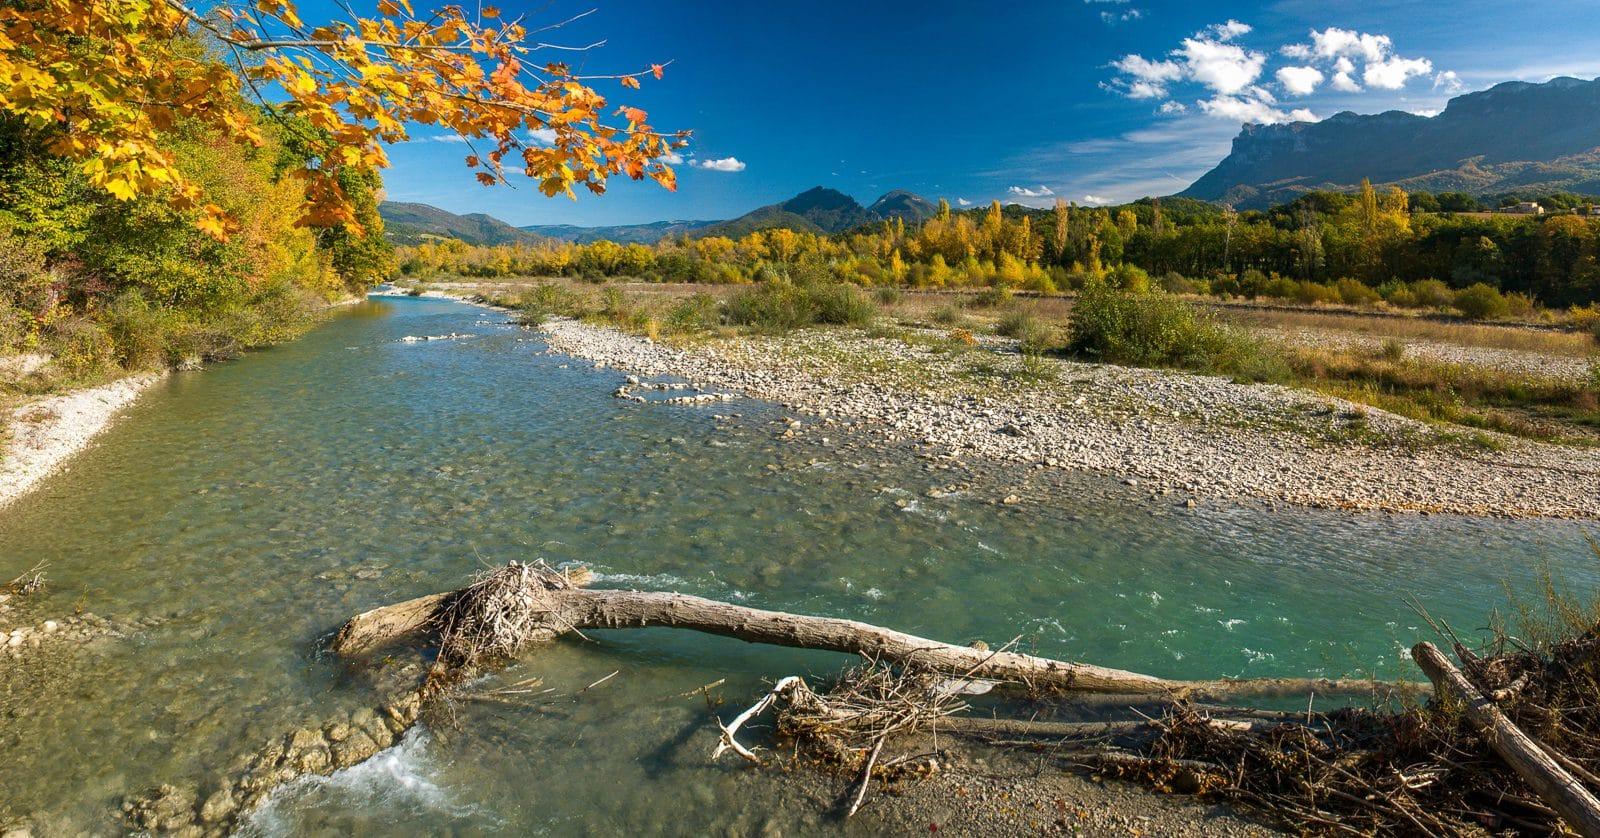 Vallée de la Drôme, attractions naturelles ©Florent Debaud